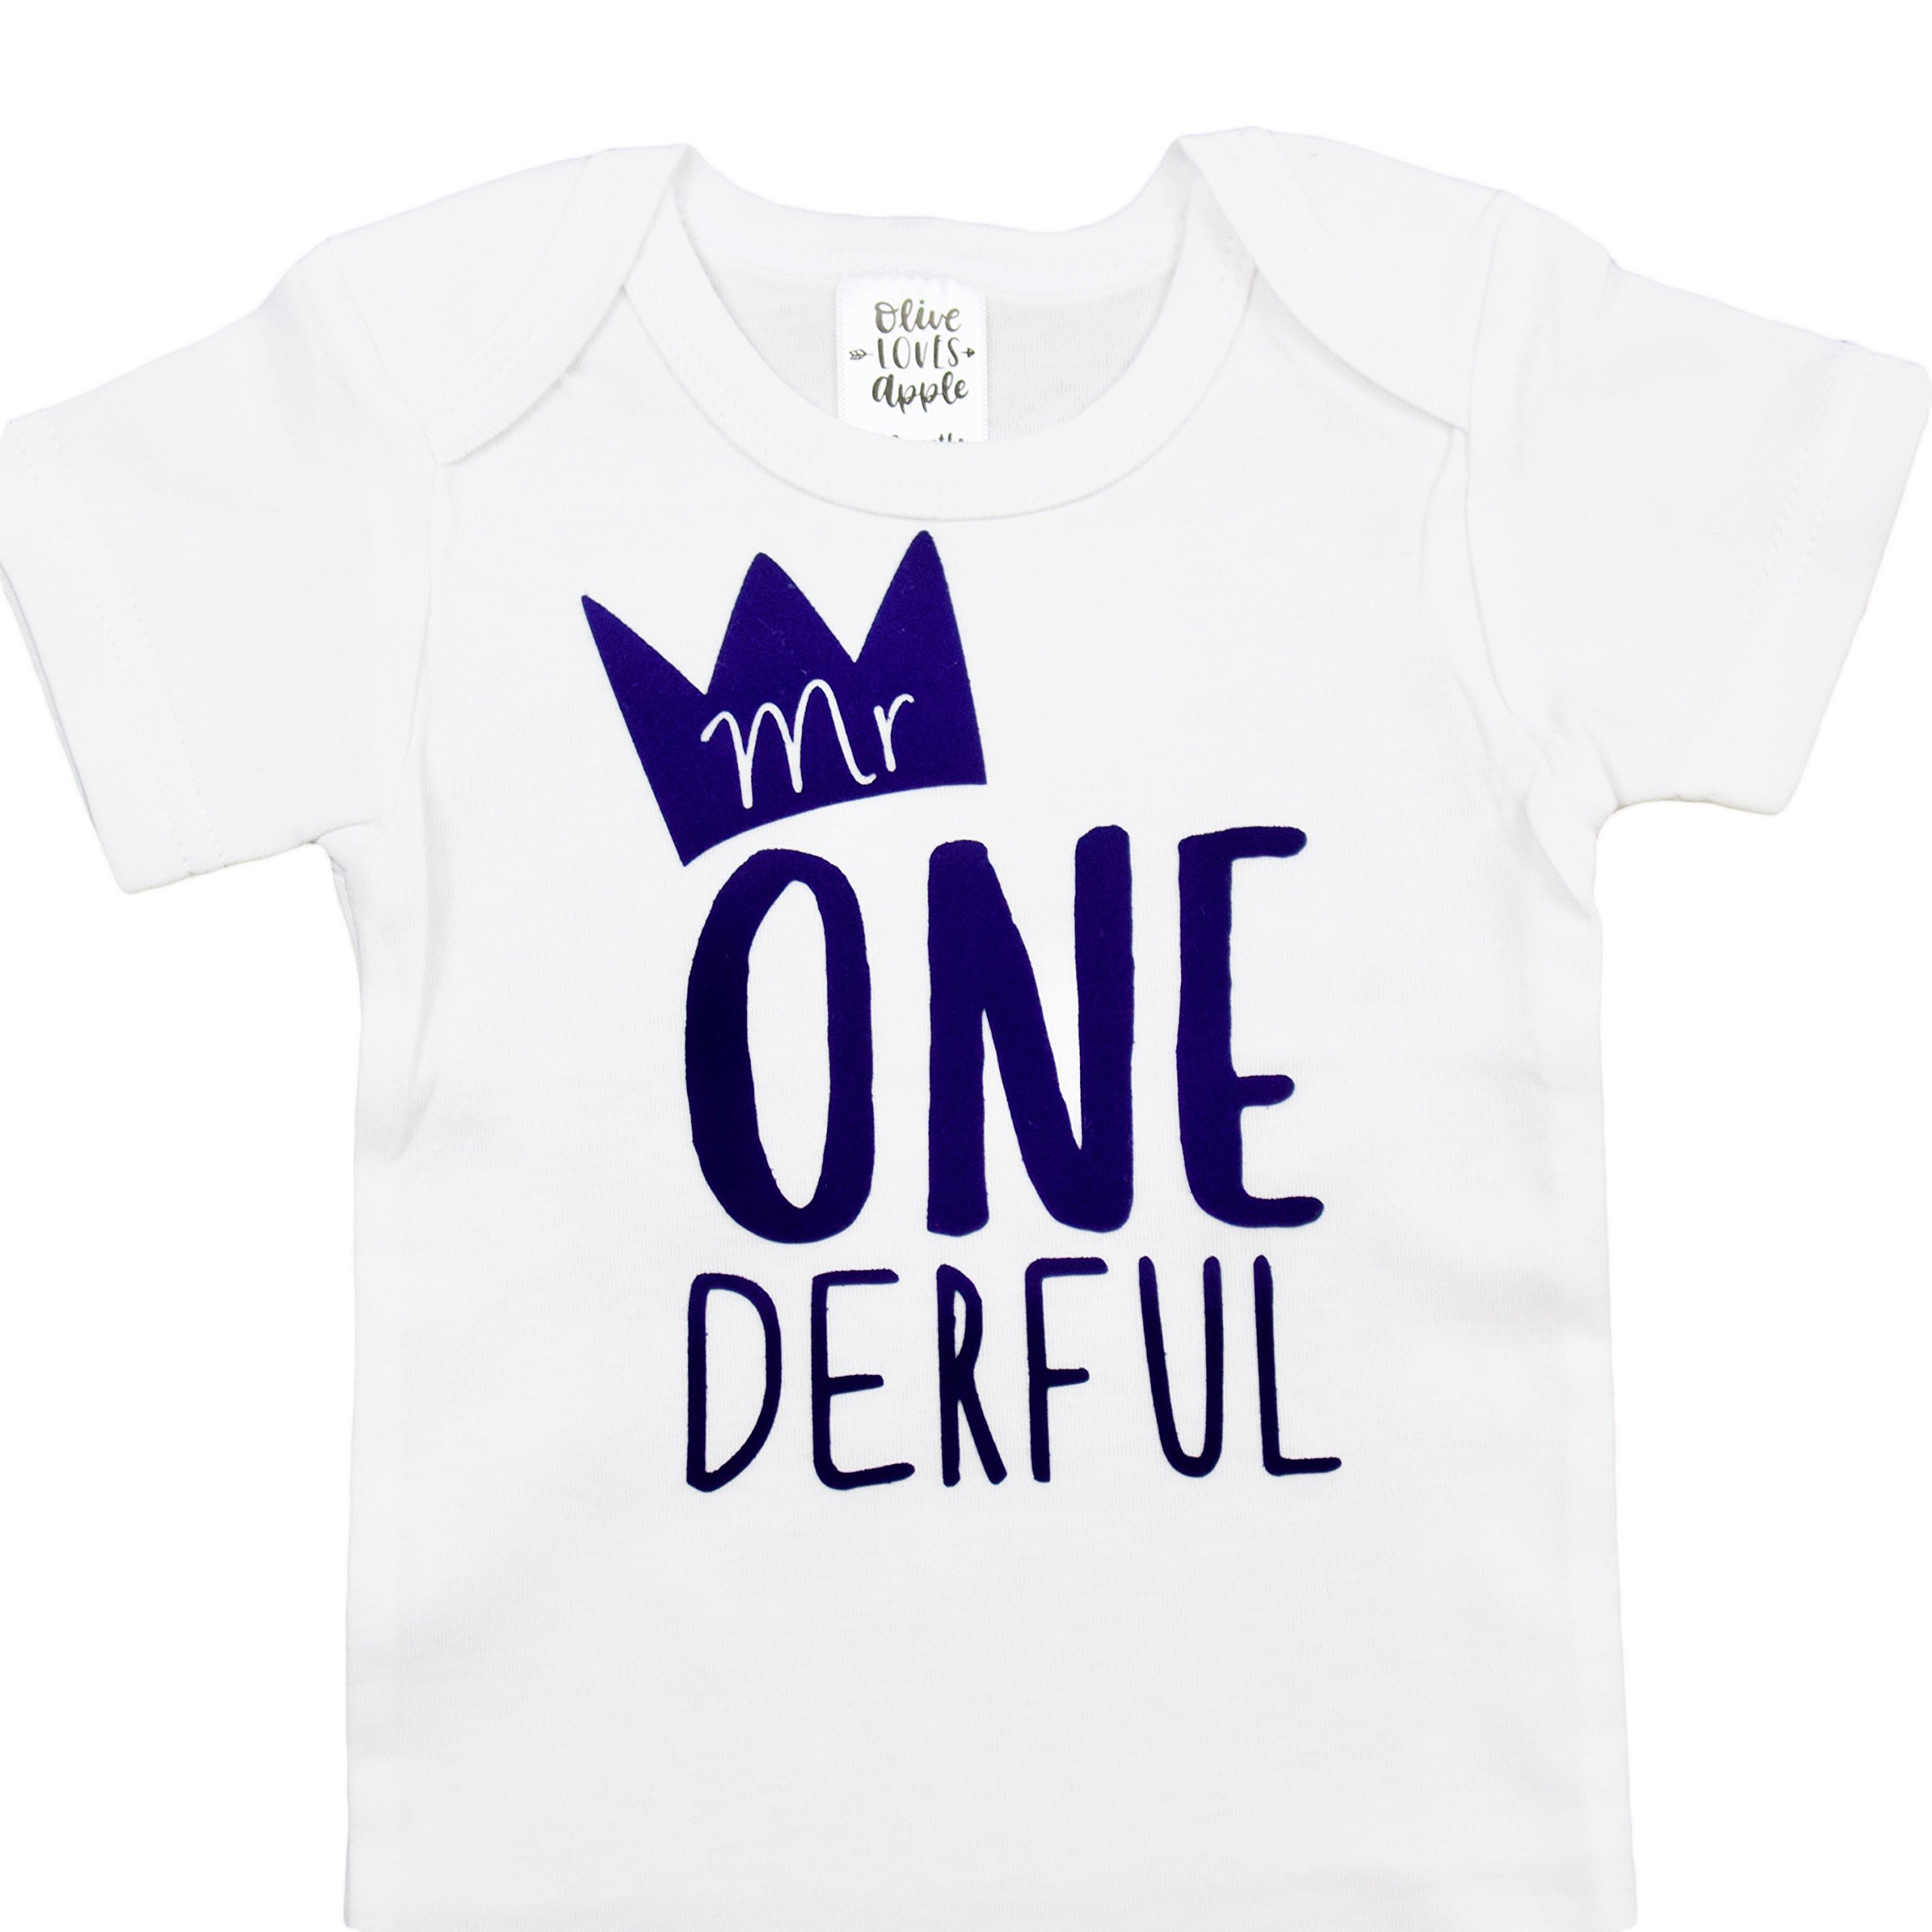 Olive Loves Apple Mr One-Derful Baby Boys 1st Birthday Onesie First Birthday Onesie for Boys Royal Blue